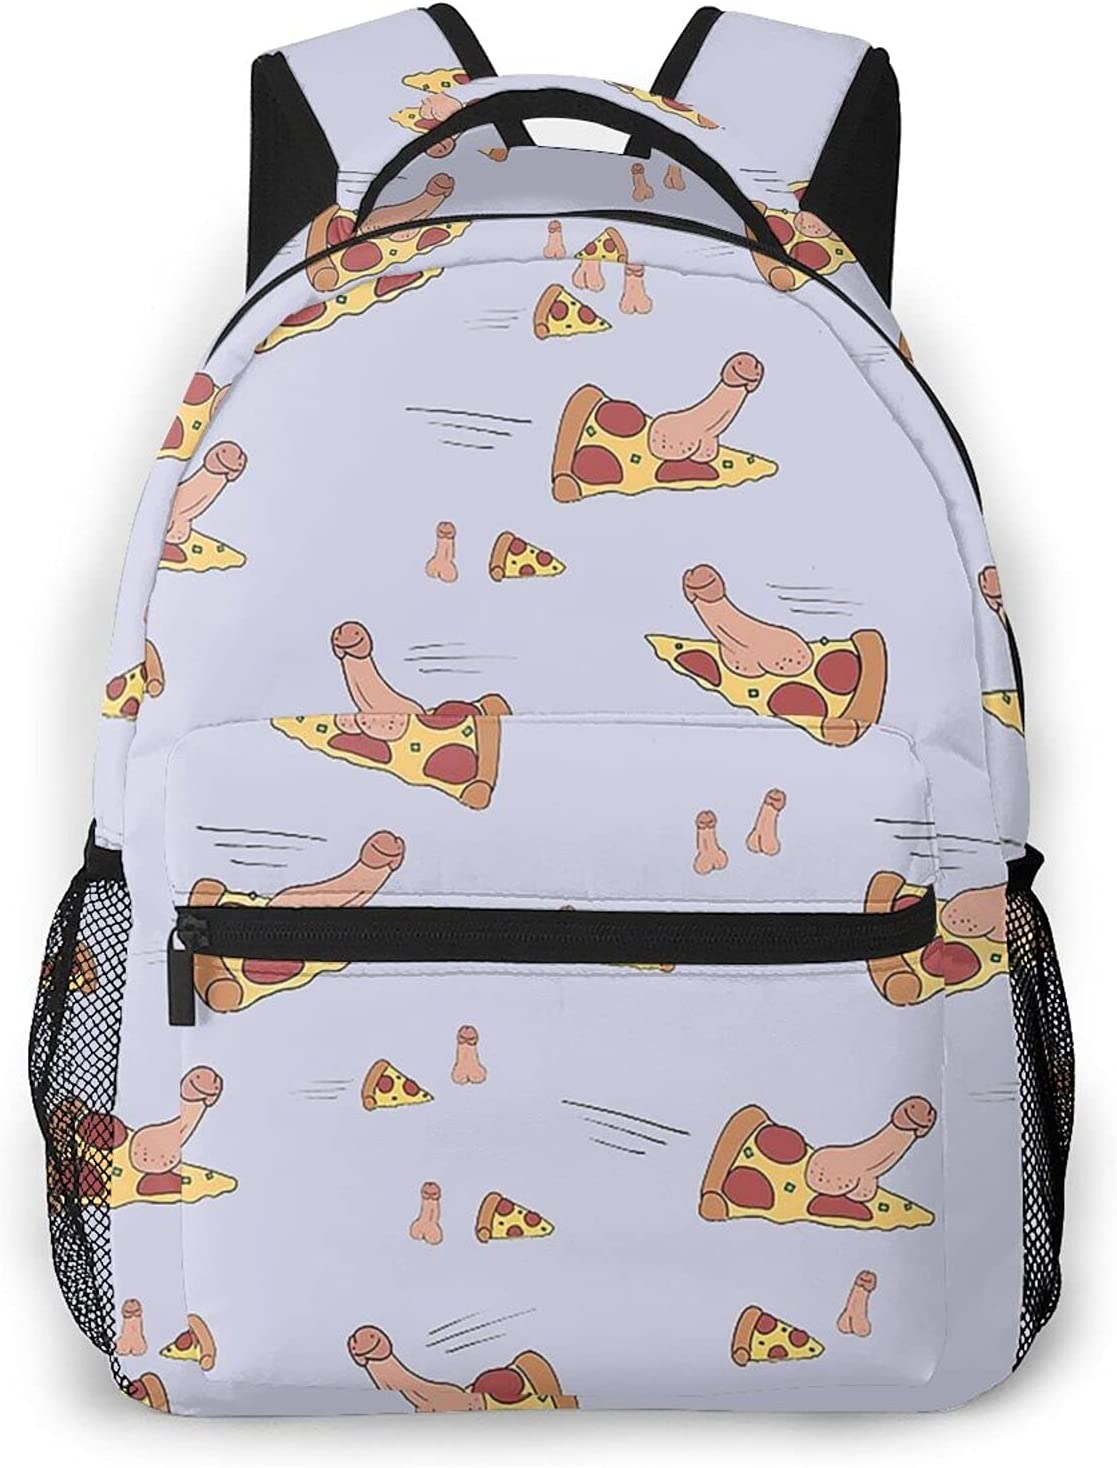 Dicks Pizza Travel Daypack Student Fixed price for sale Rucksack 2021 Laptop Ligh Backpack